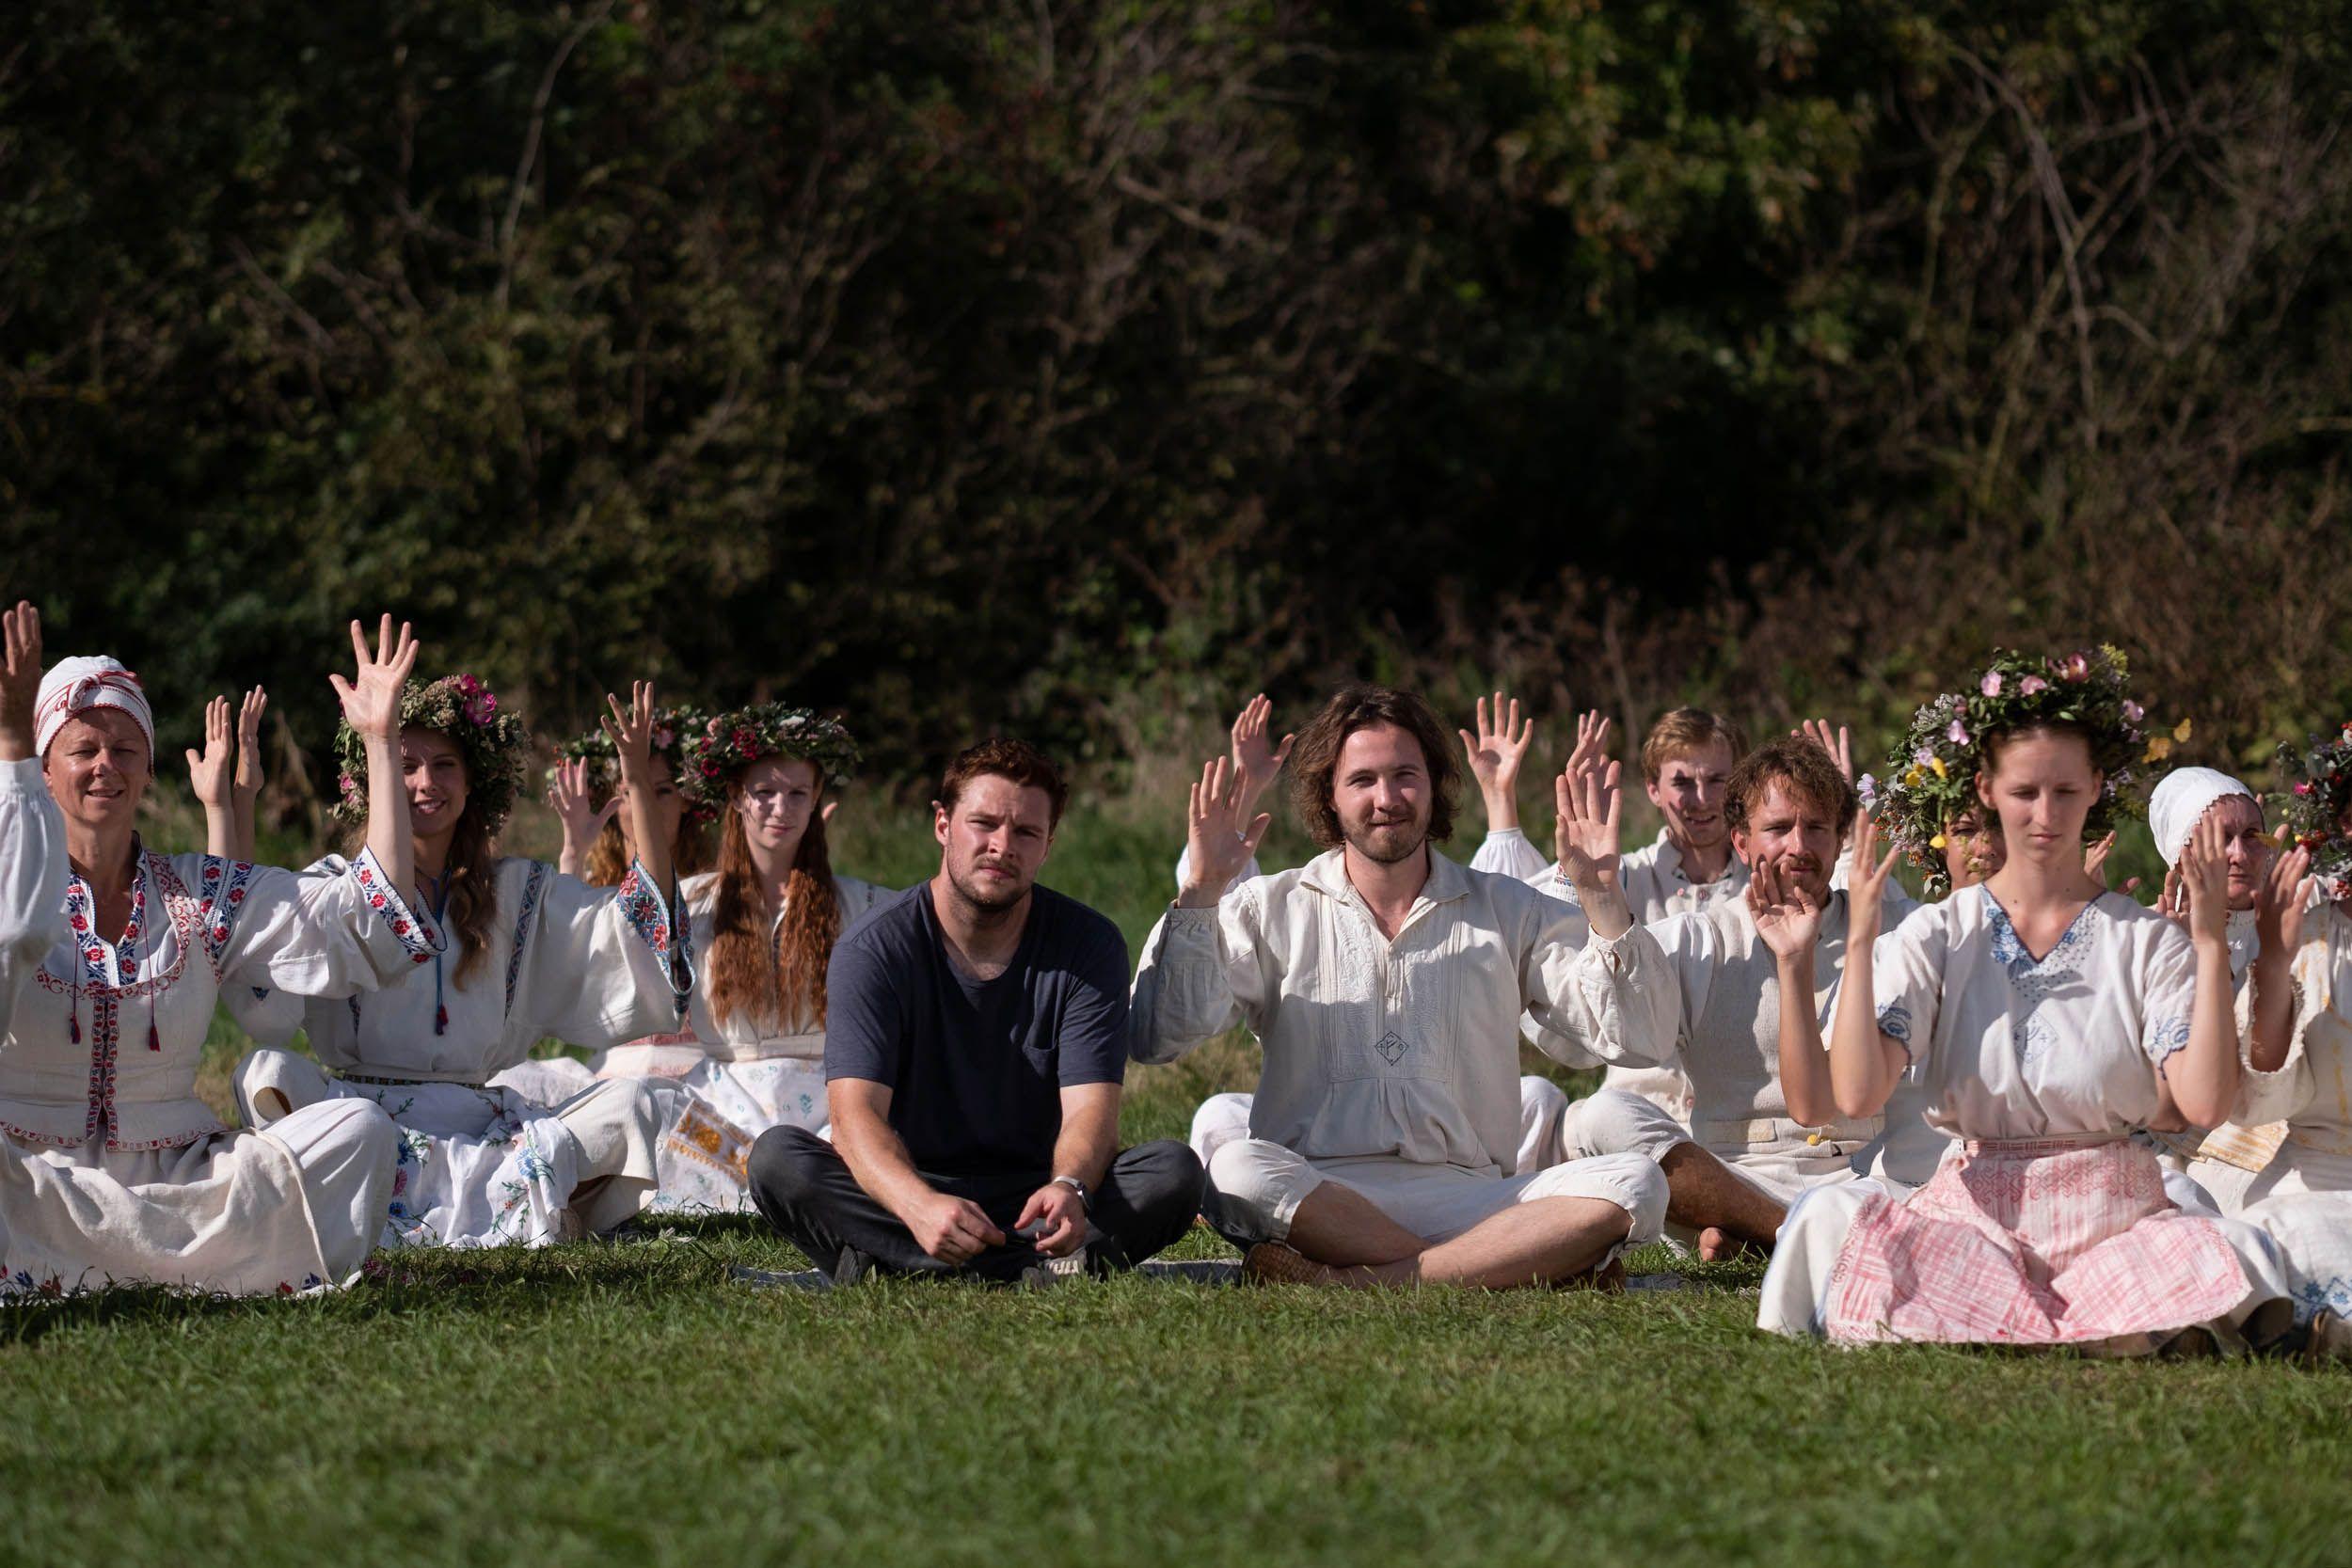 How Midsommar Warped Sweden's Real Midsummer Festival Into Horror